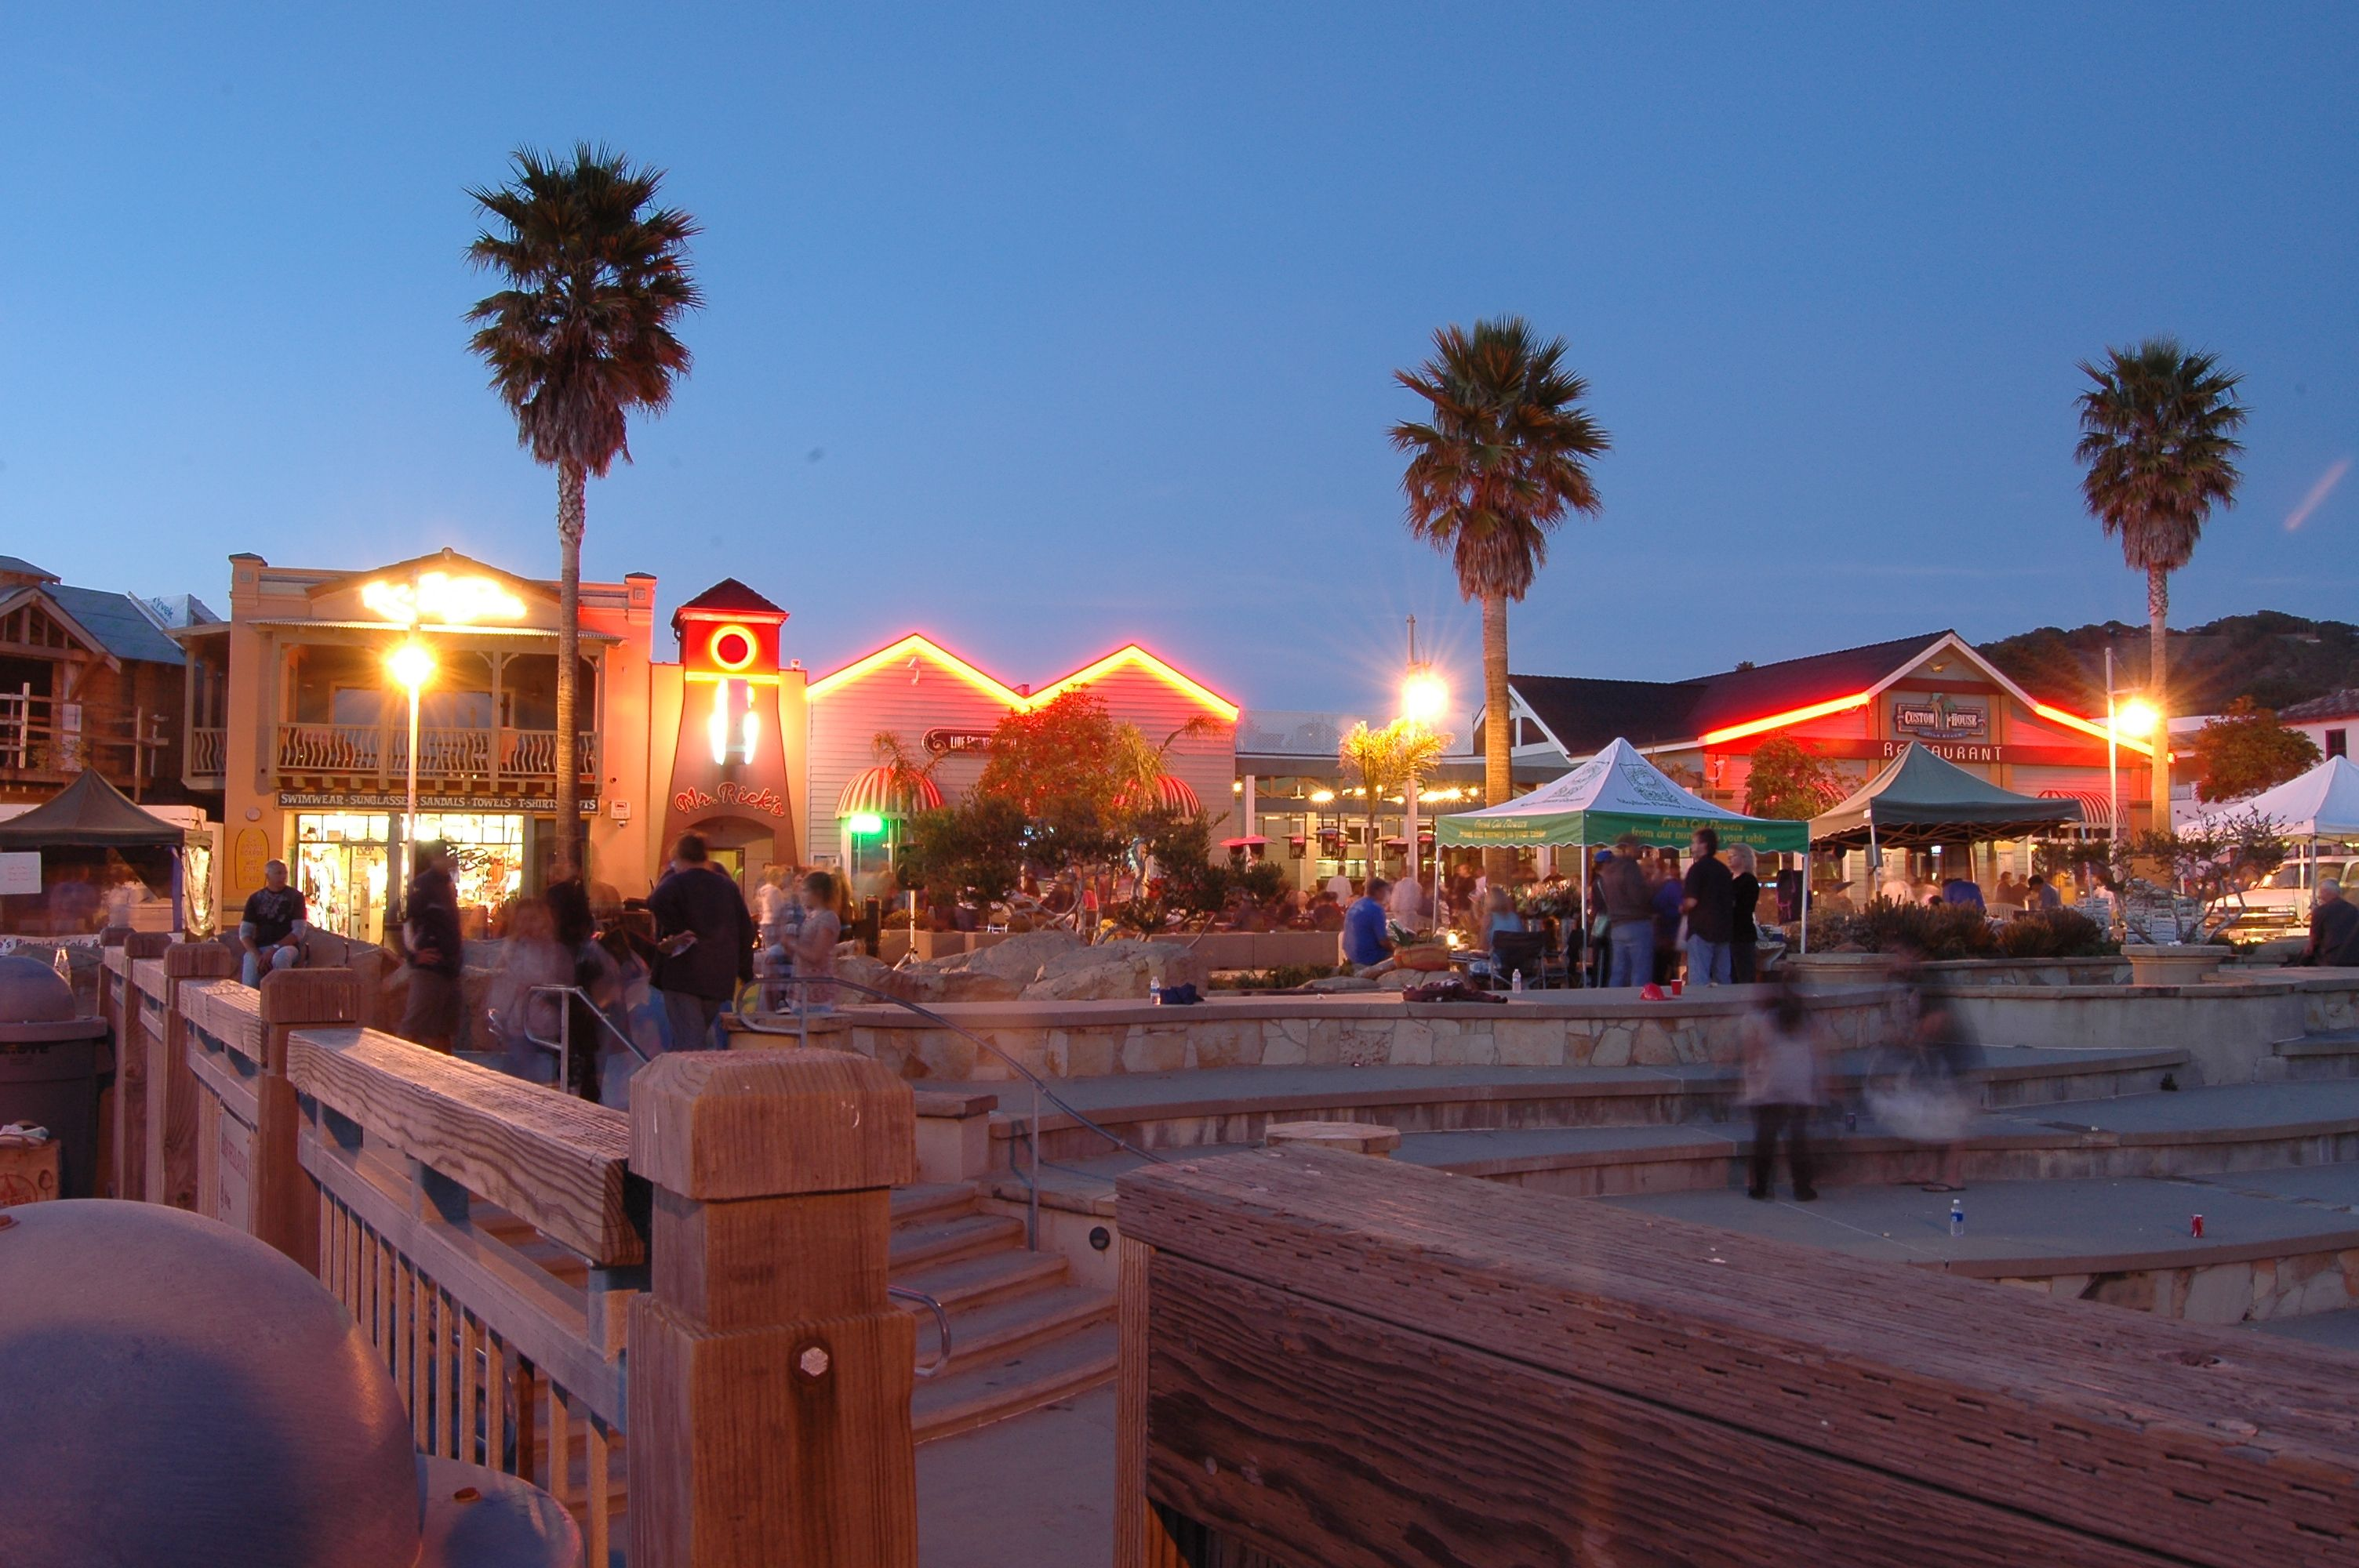 Nighttime At The Avila Beach Fish Farmers Market